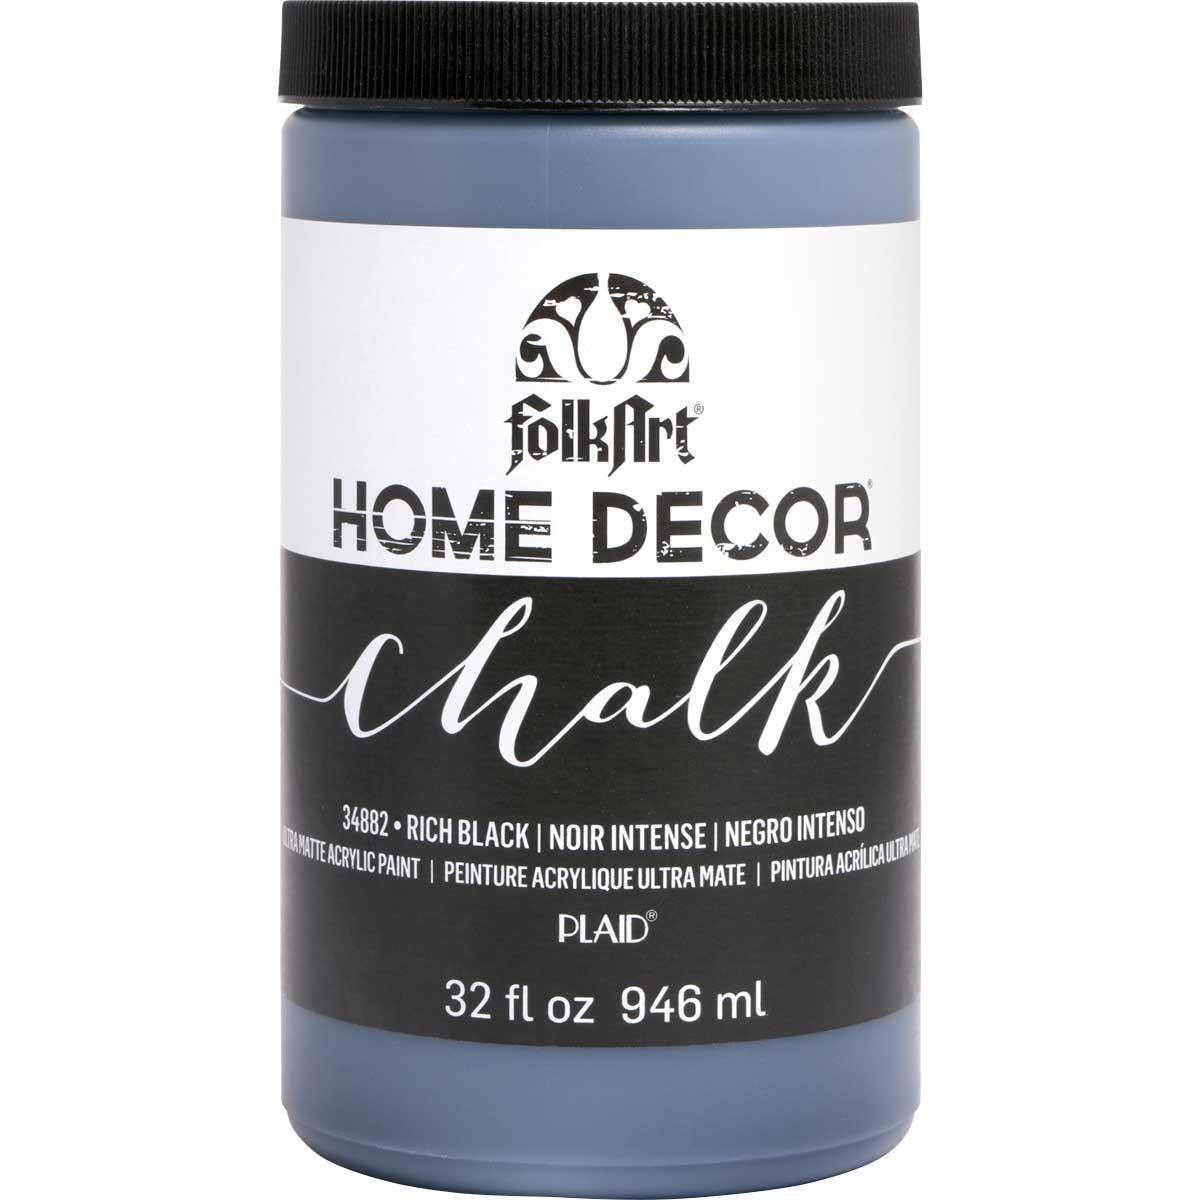 FolkArt ® Home Decor™ Chalk - Rich Black, 32 oz. - 34882